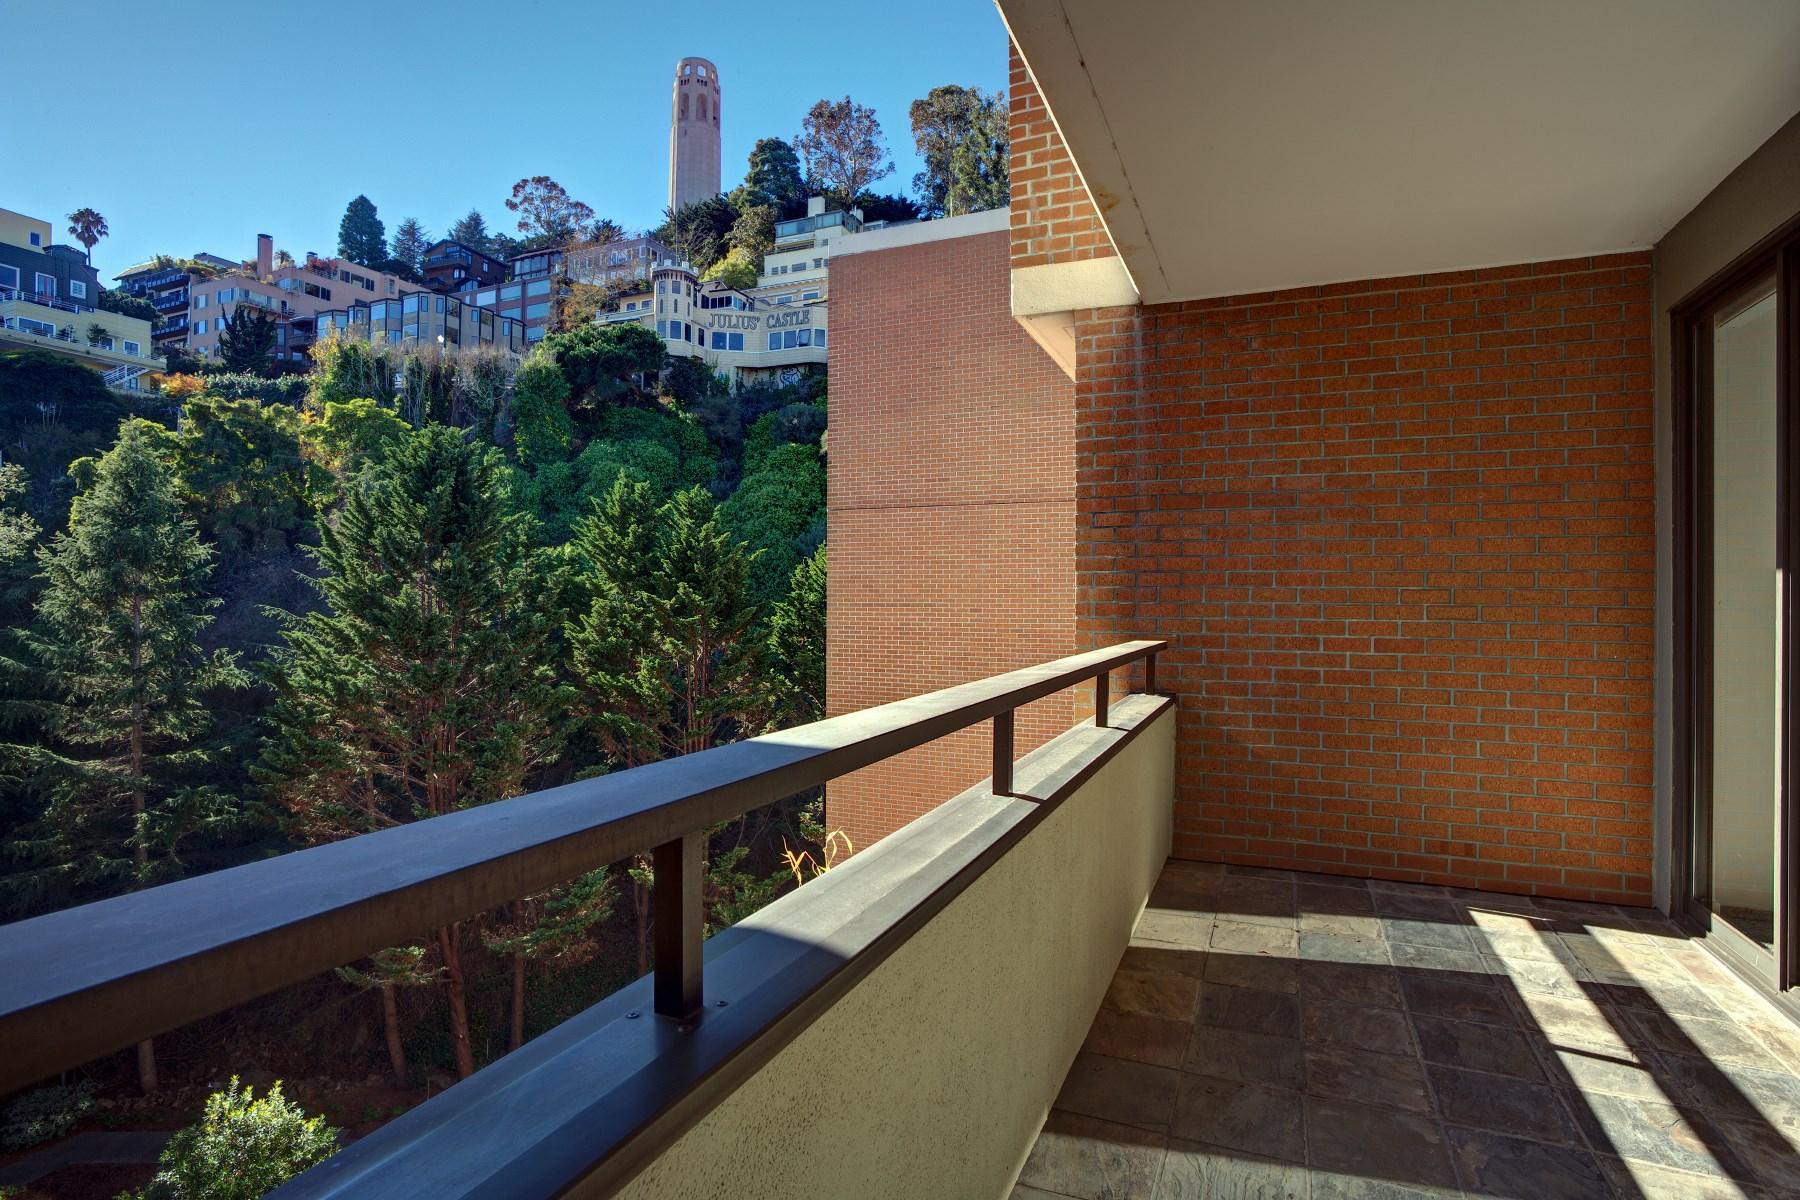 Nhà chung cư vì Bán tại Spacious Condo in Amenity Building 101 Lombard St Apt 812w Telegraph Hill, San Francisco, California 94111 Hoa Kỳ